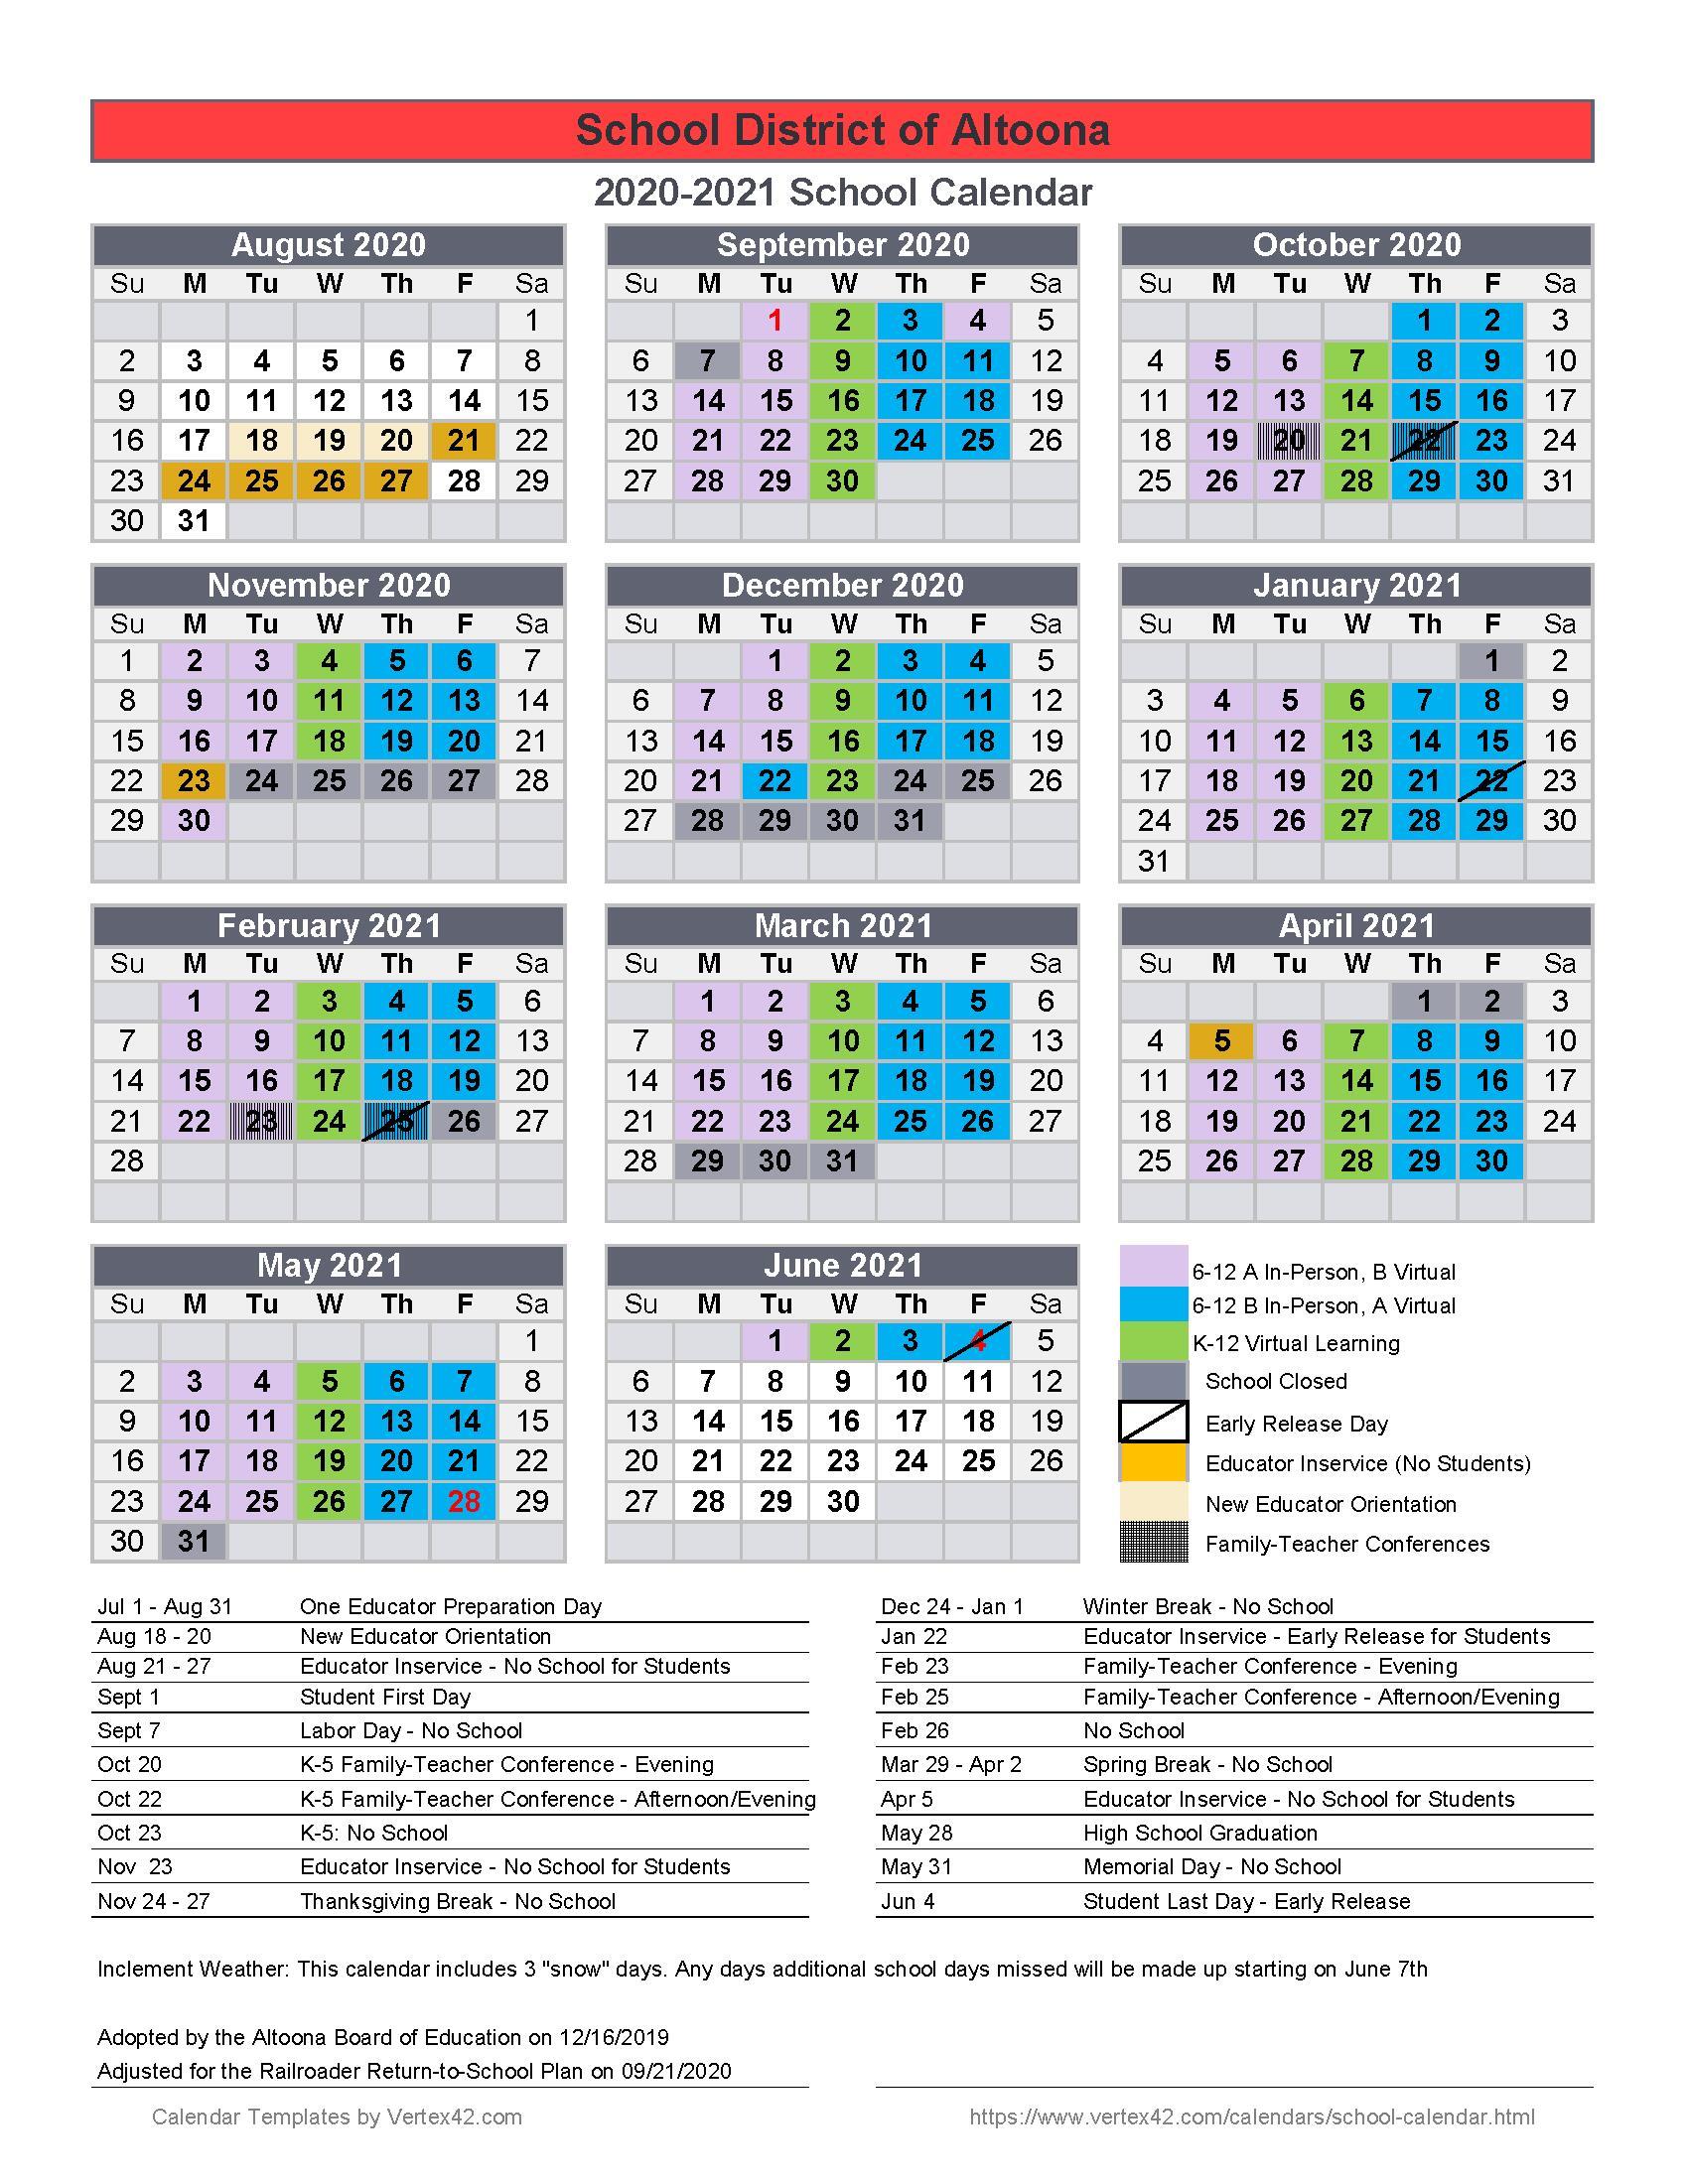 School Year Calendars | Parents